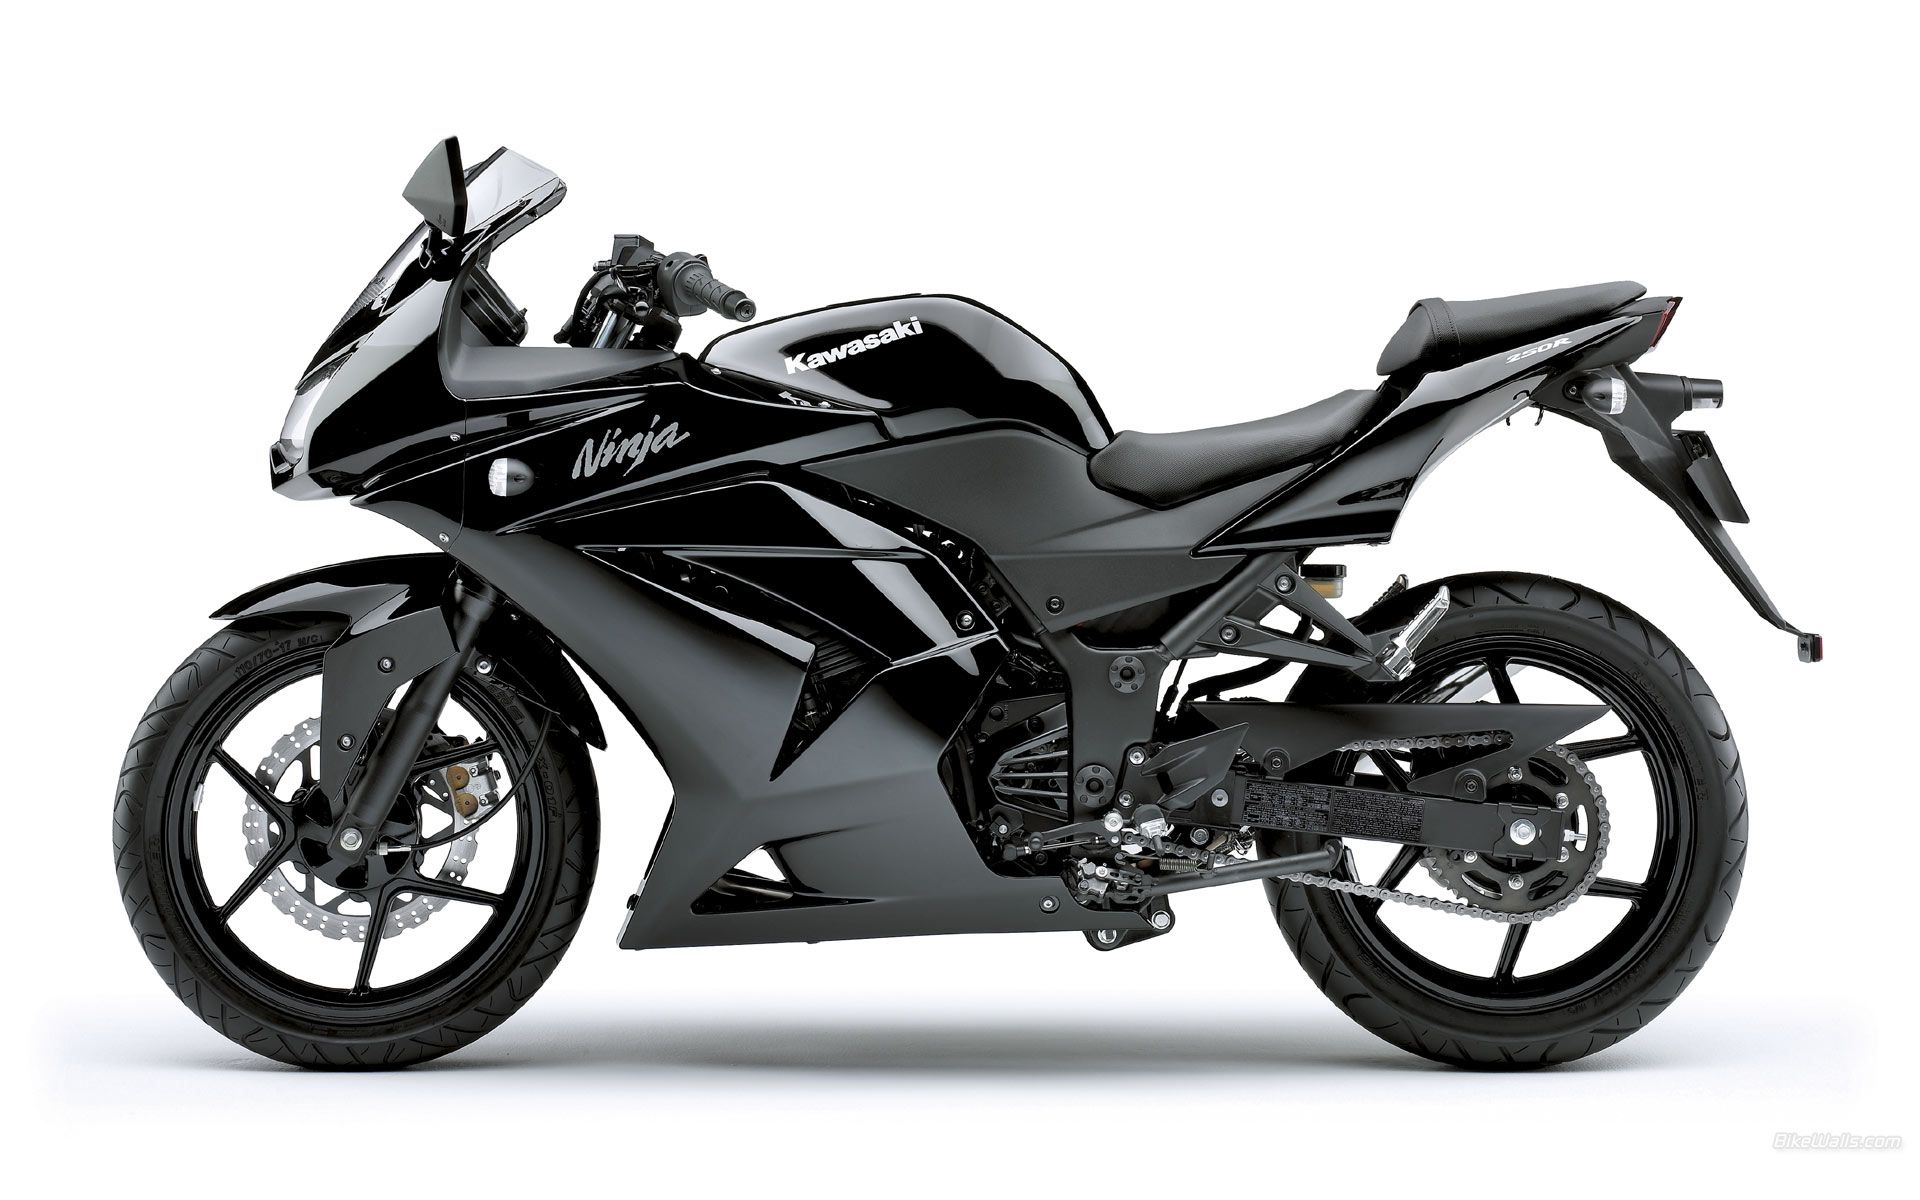 kawasaki ninja 250r | carros e motos | pinterest | kawasaki ninja